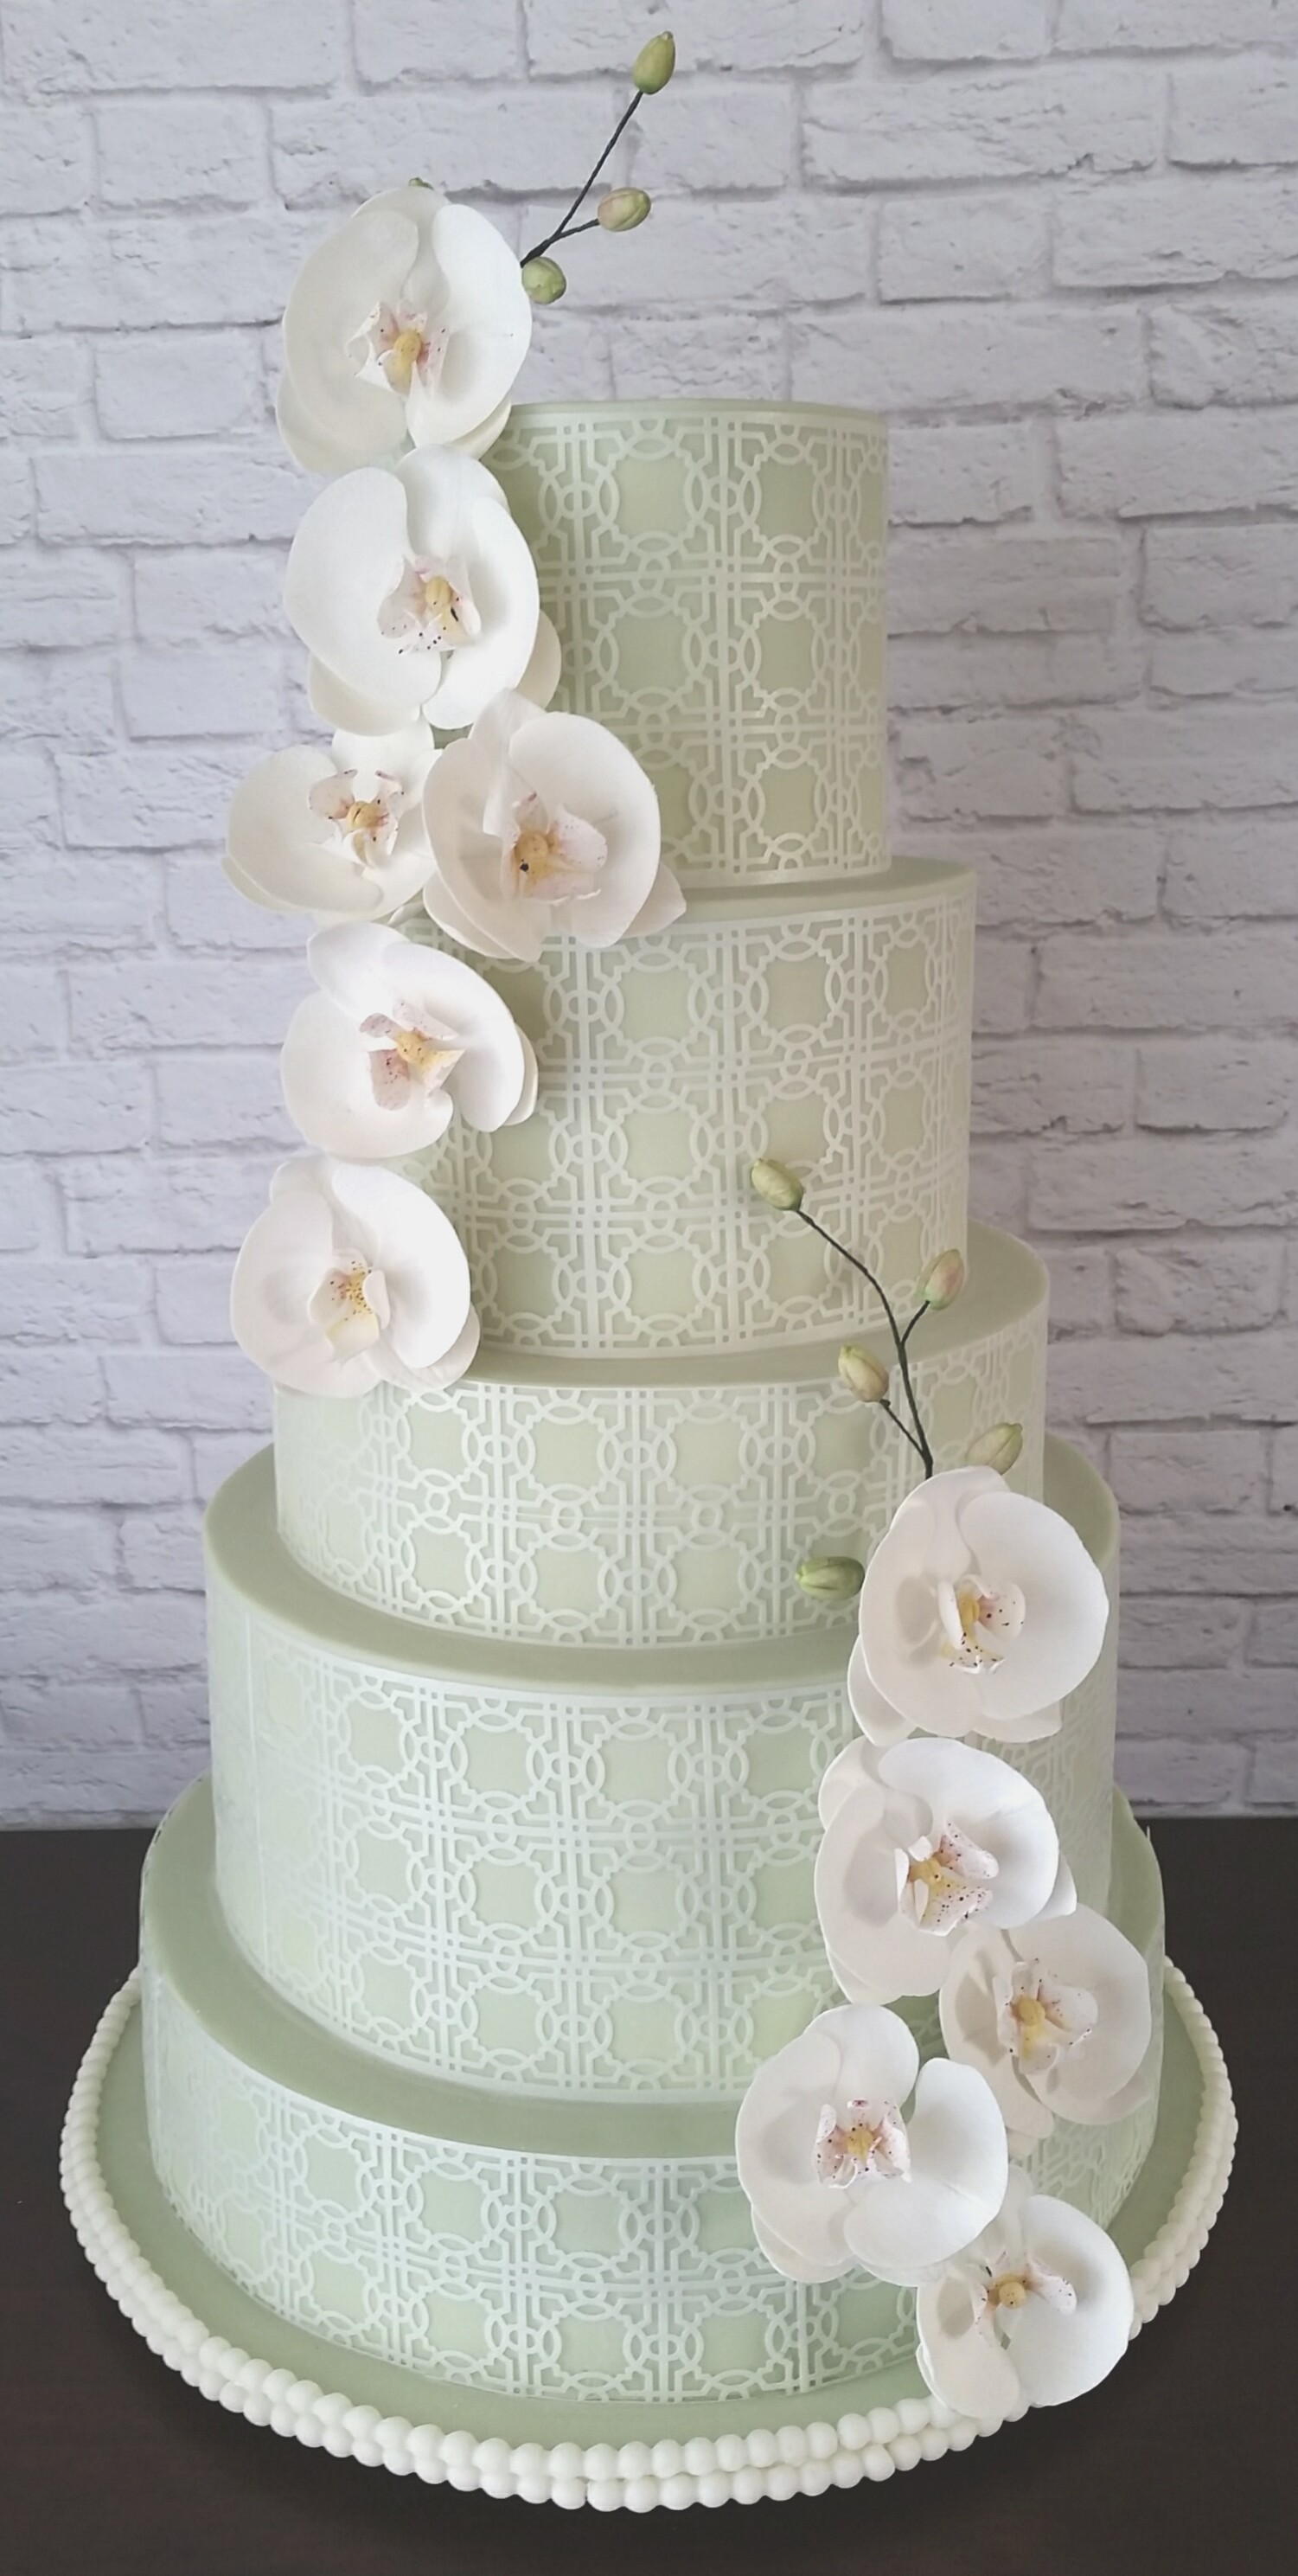 Ashley-Barbey-The-Little-Vintage-Baking-Company-Wedding-Elegant-5.jpg#asset:12199